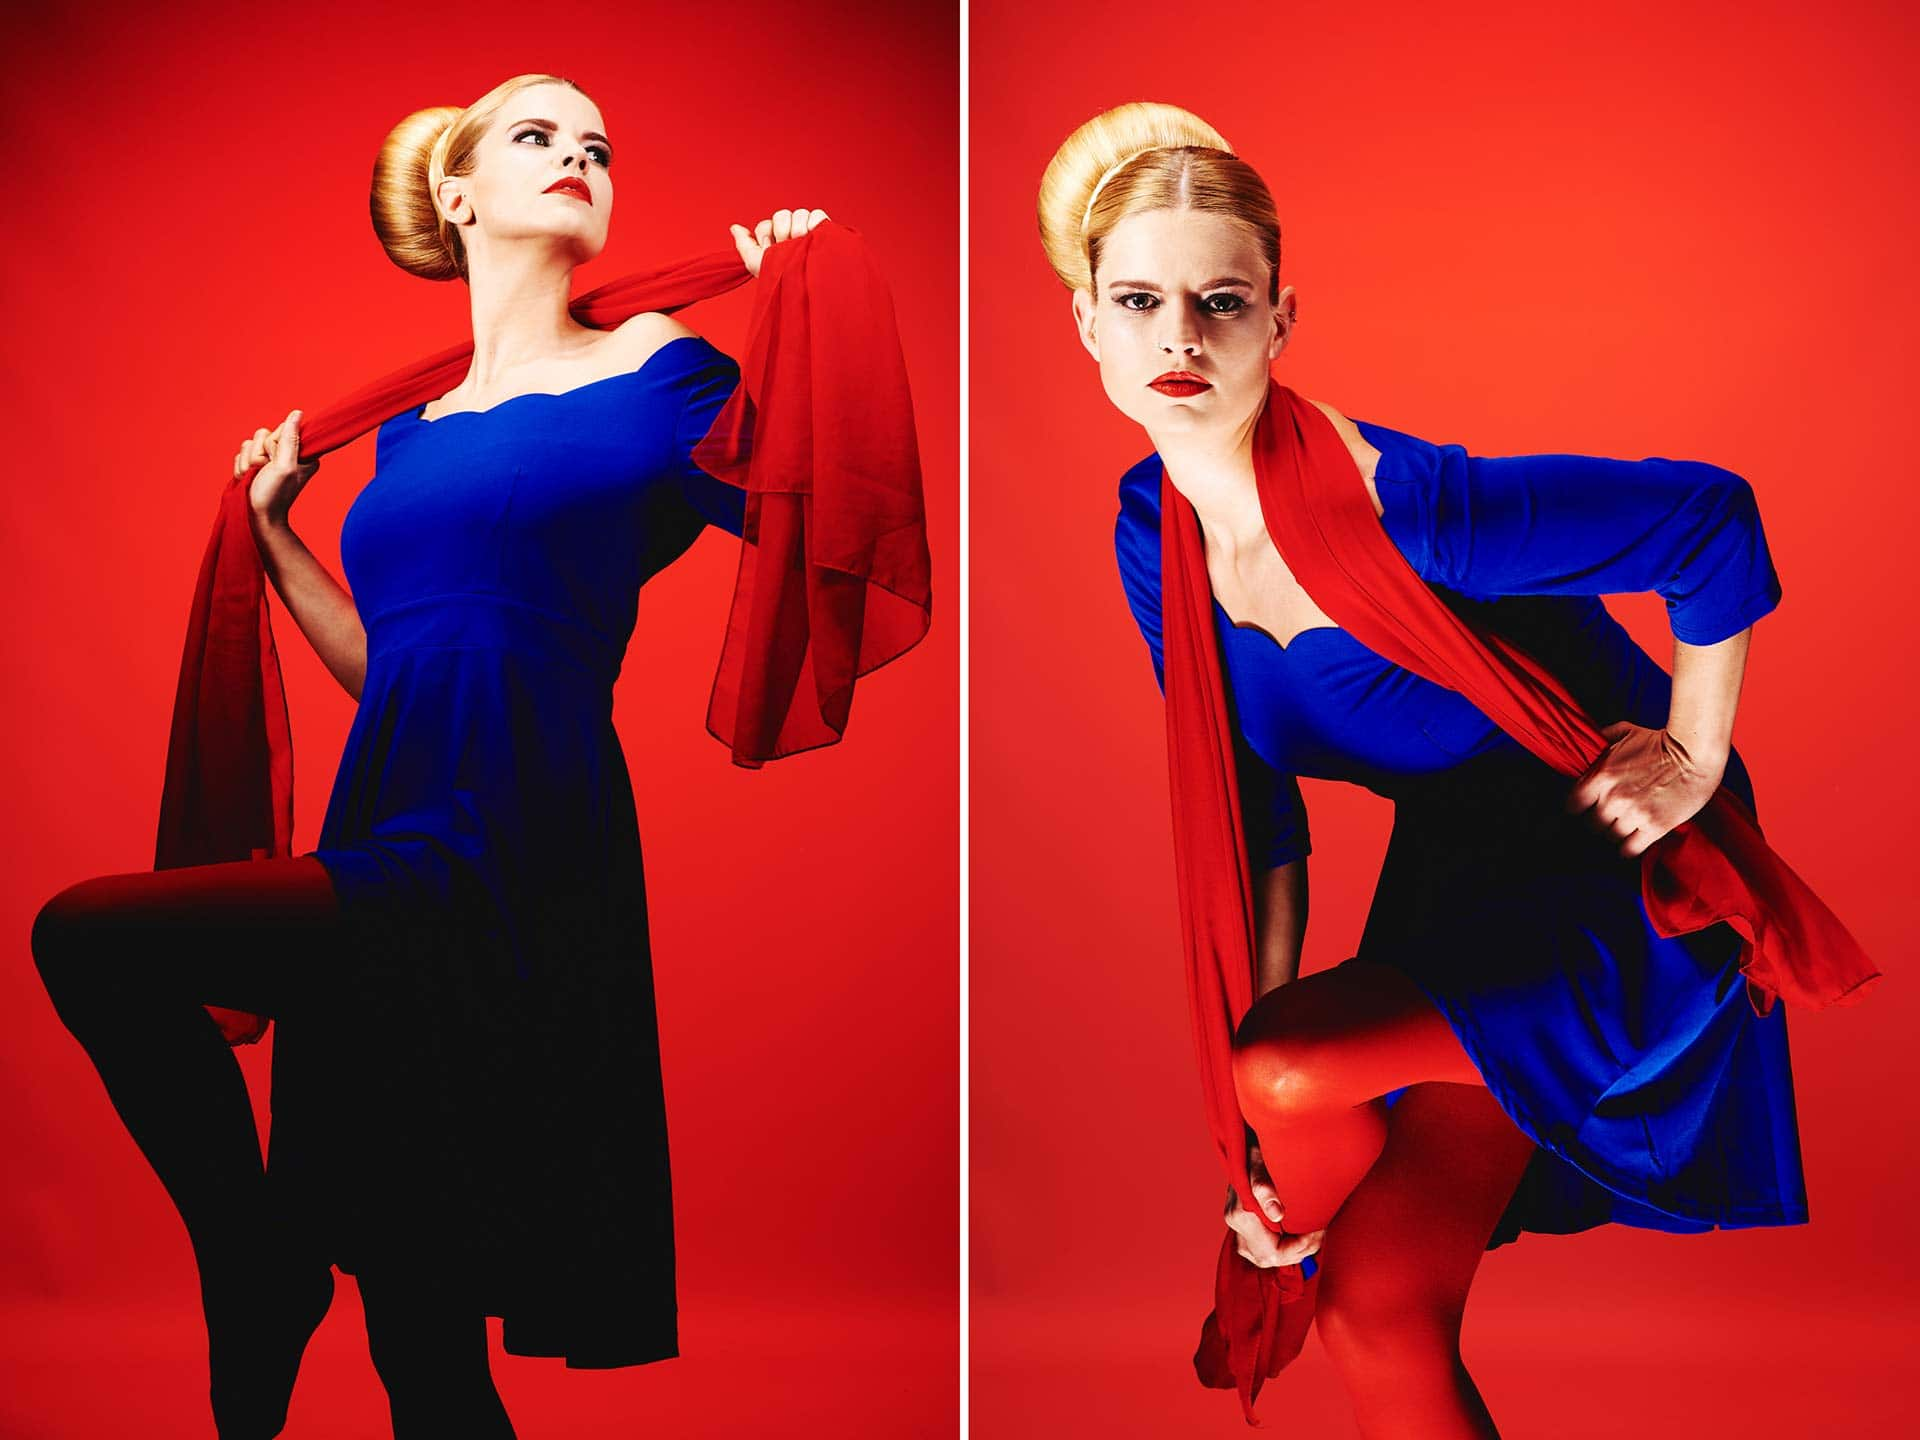 Fotograf Fürth, Color blocking Fotoshooting Make-up Artist School by Carola Hickl